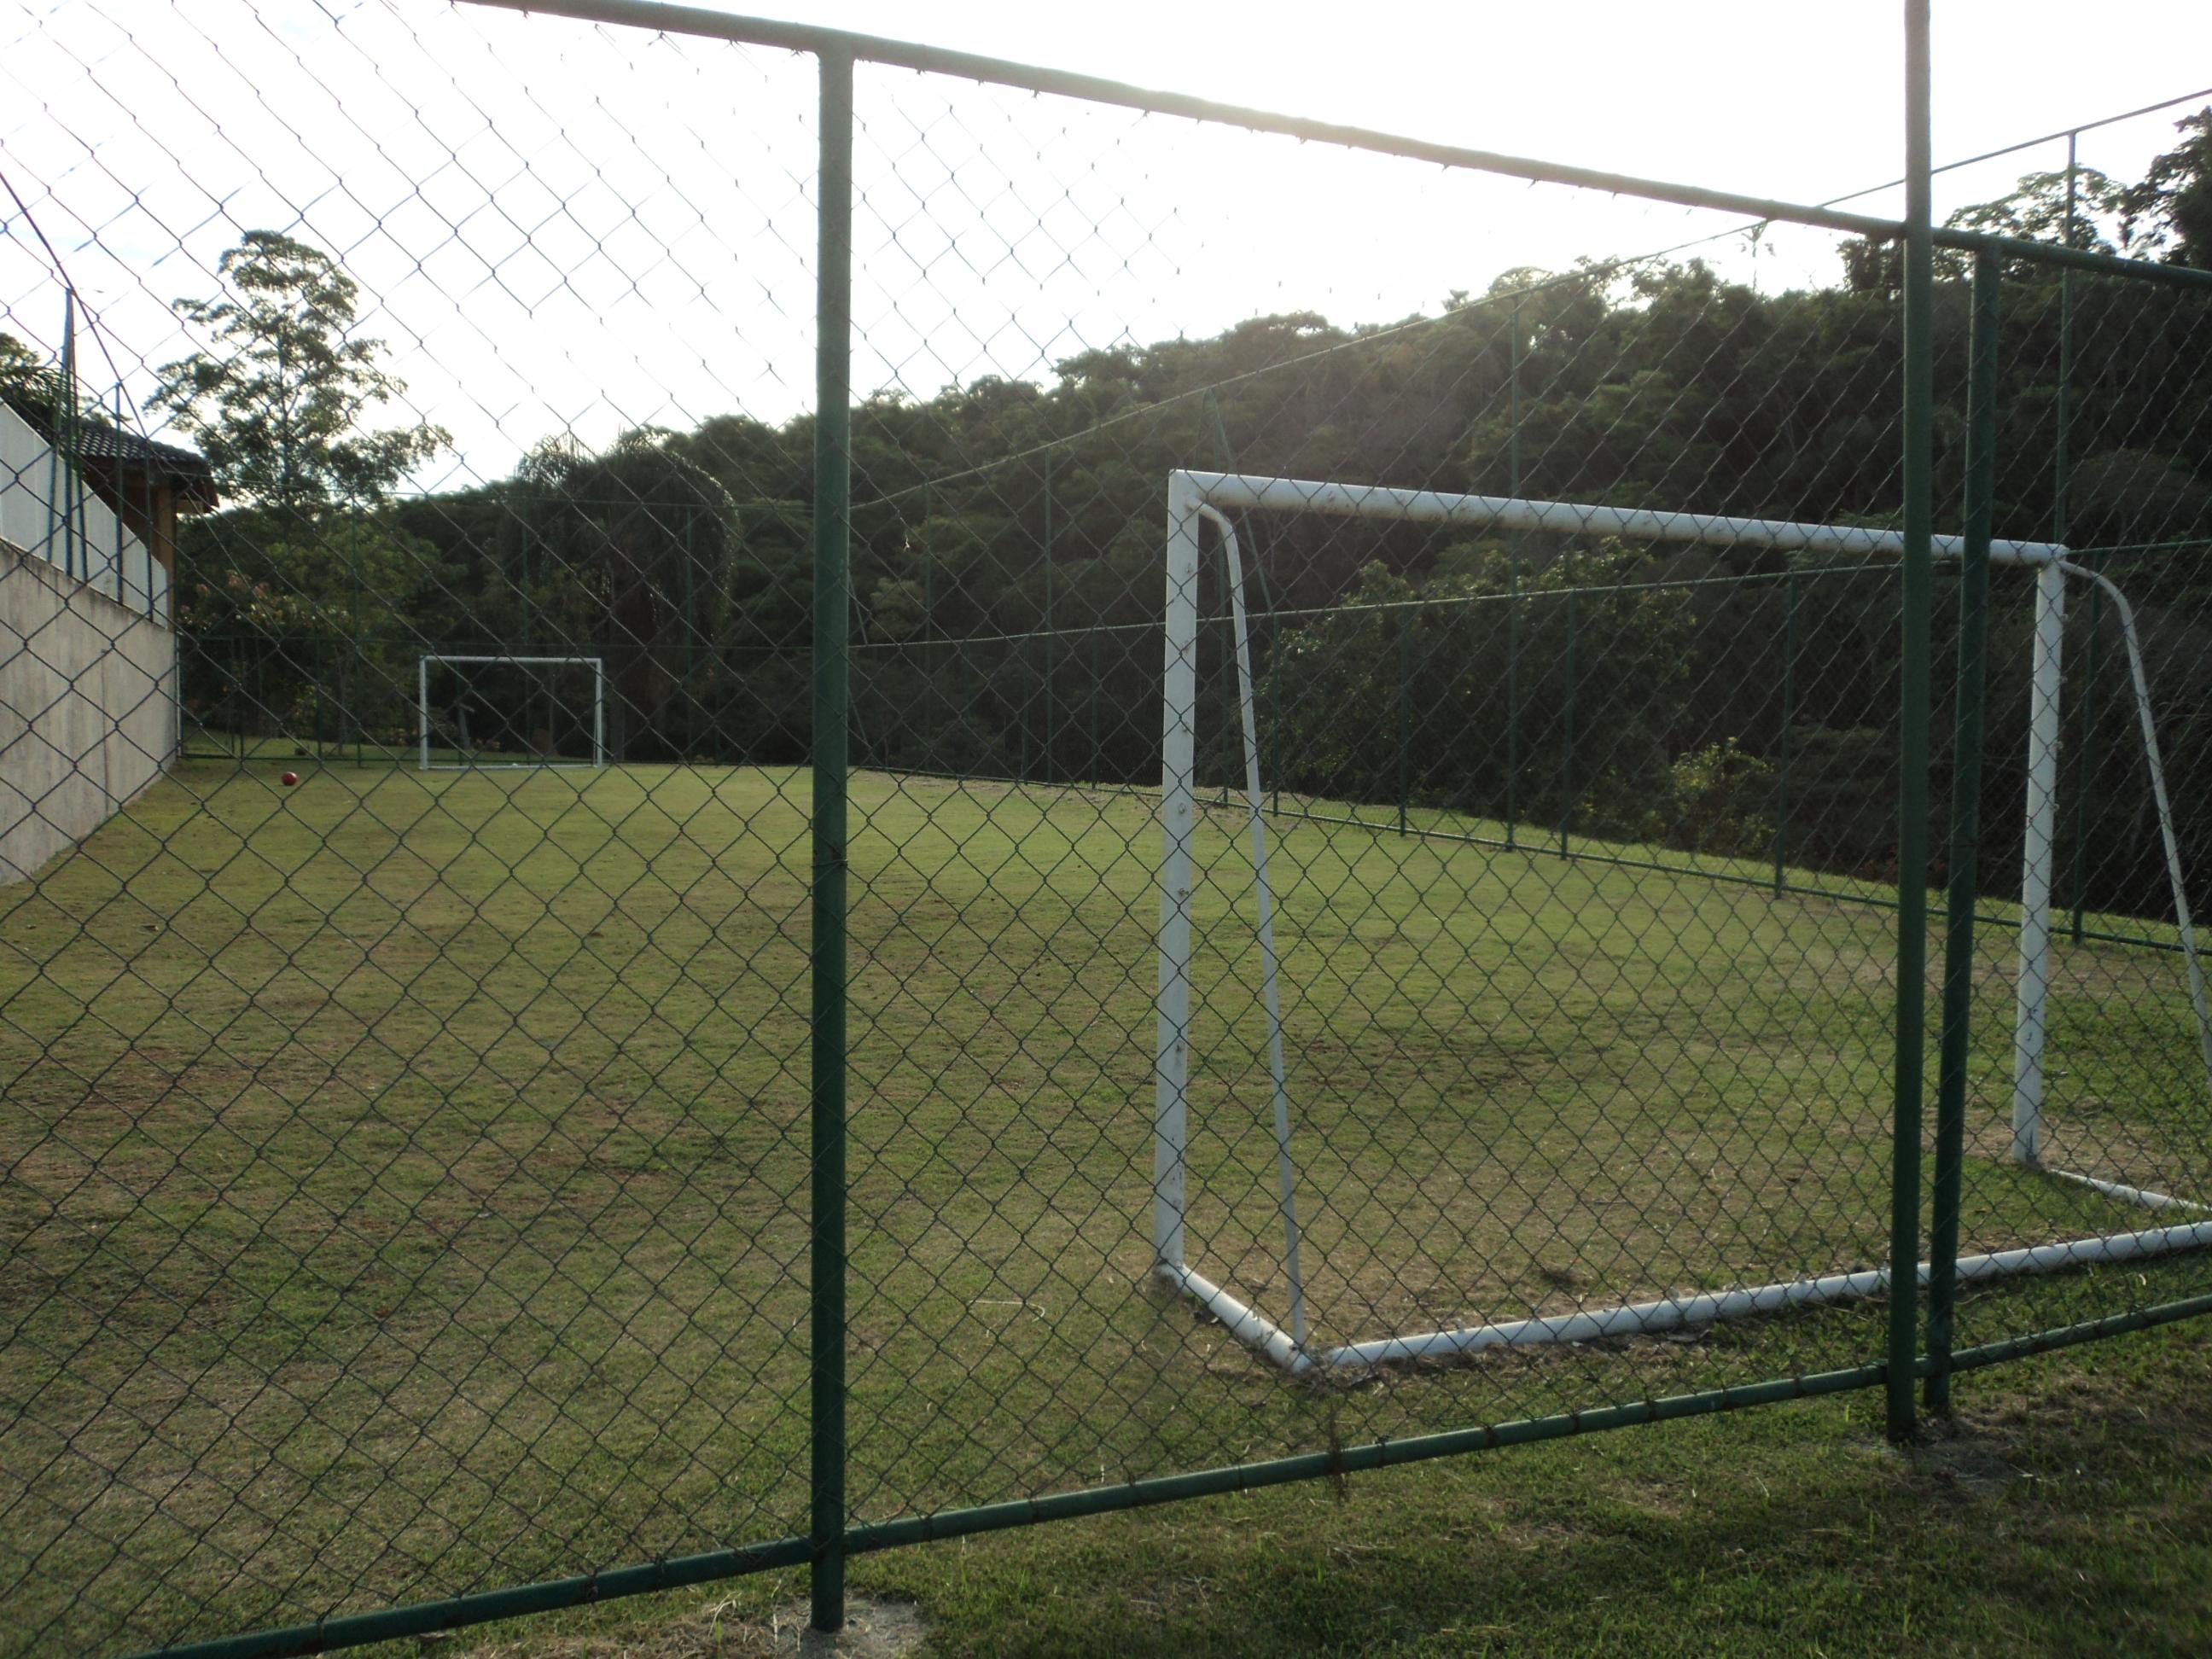 sitio santa clara campo de futebol